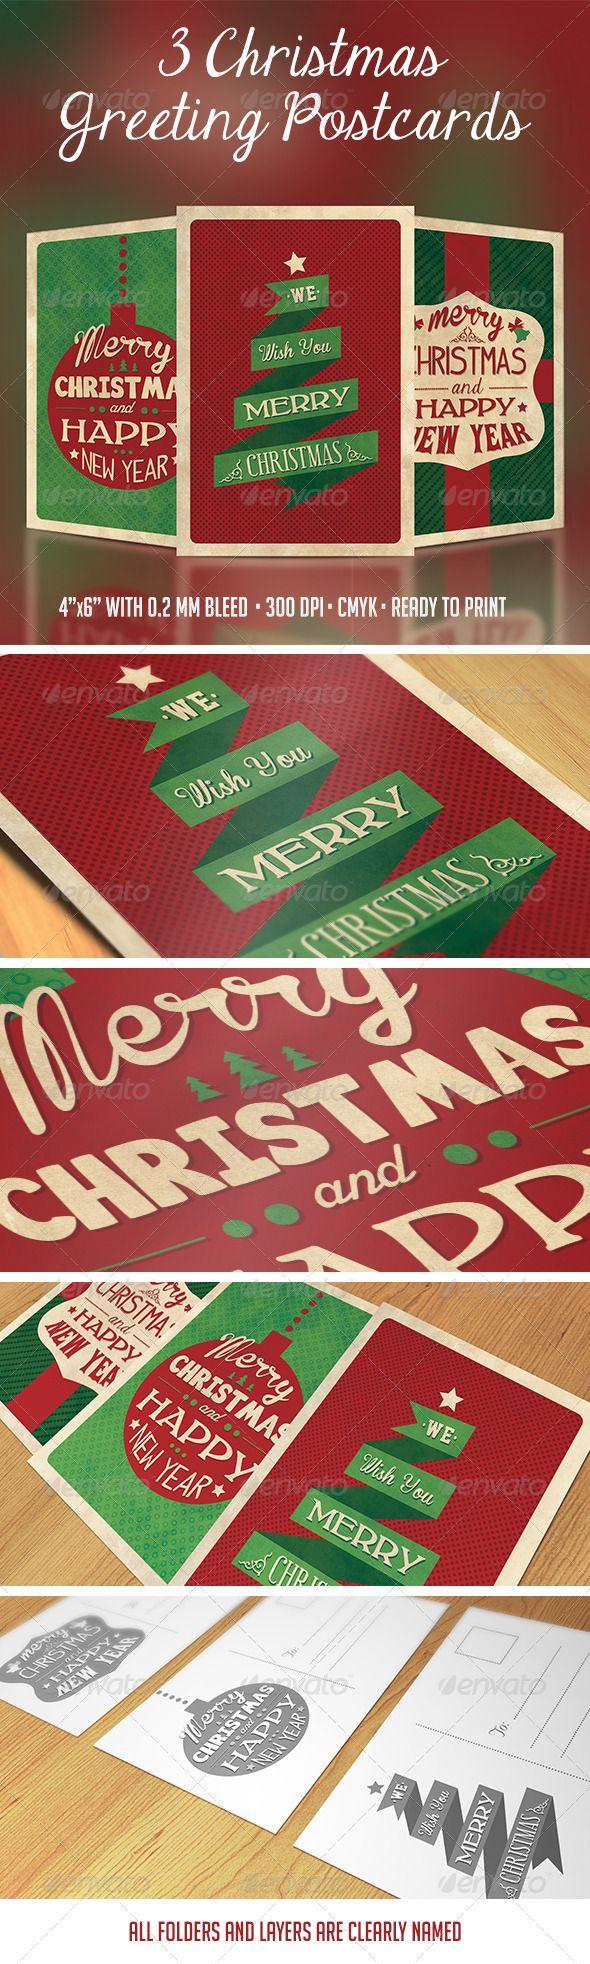 3 Christmas Greeting Postcards Christmas Design Nails Pinterest